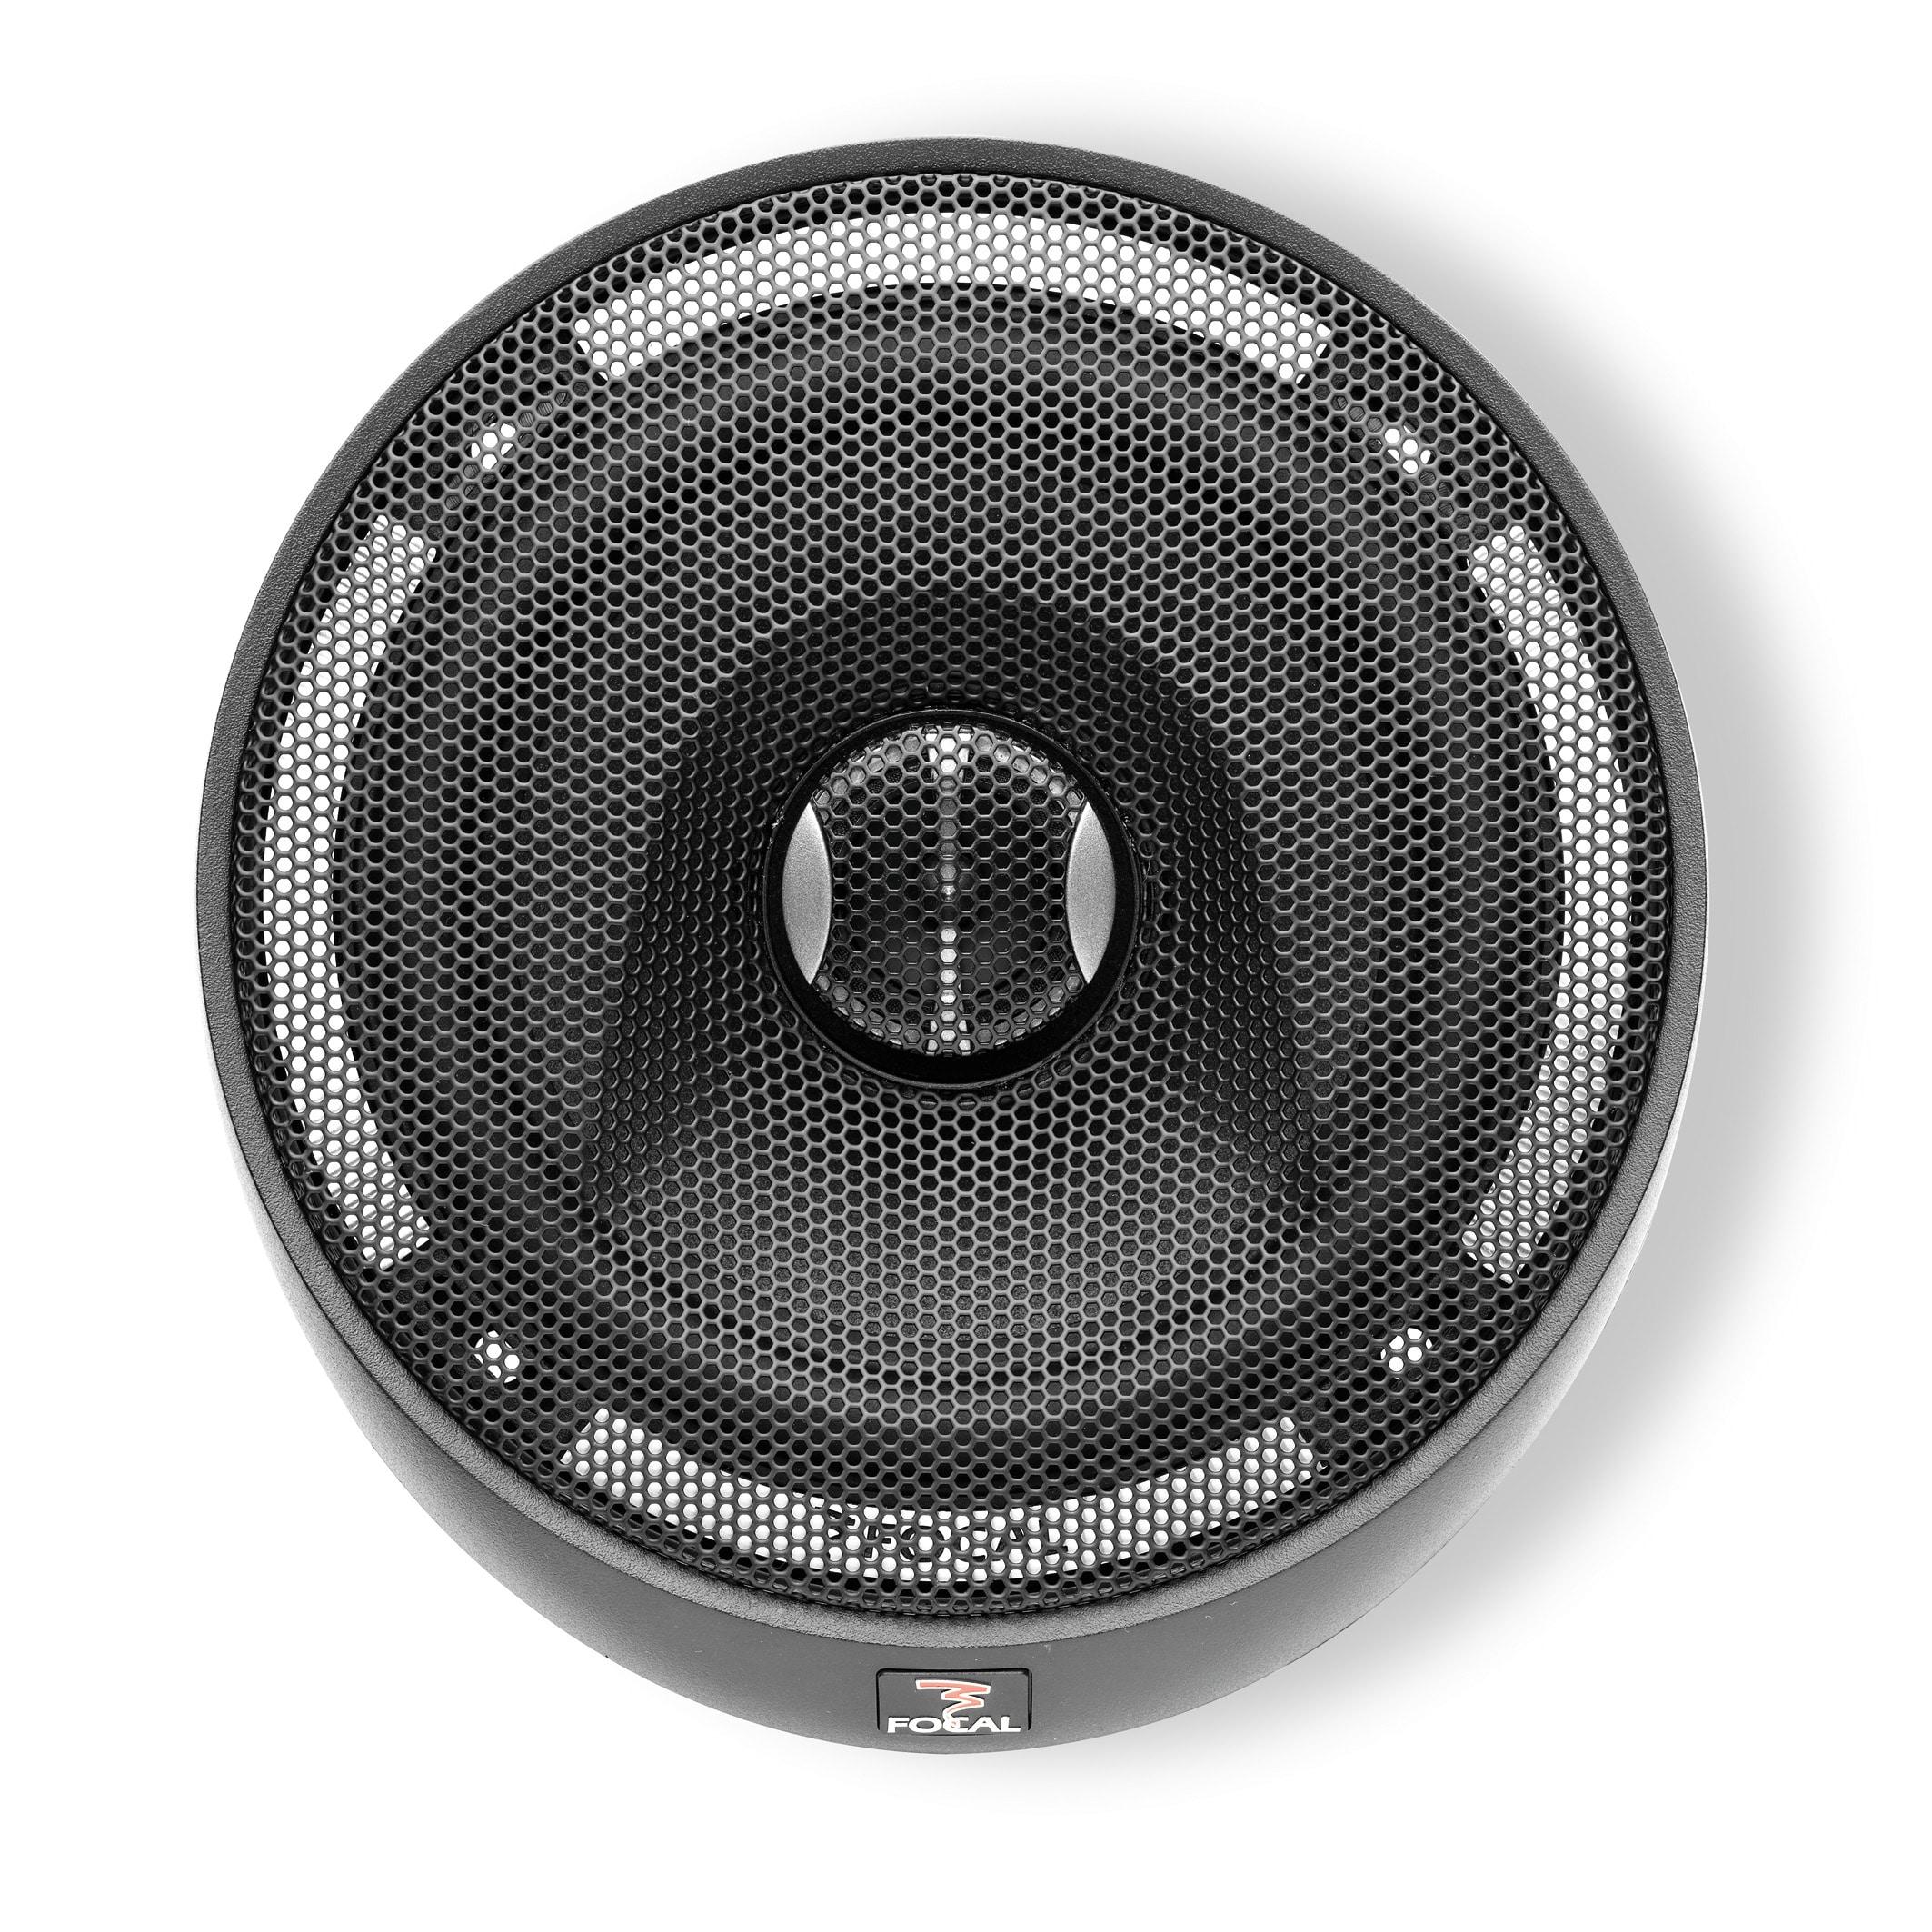 focal pc 130 paar koaxial 2 wege 130mm 13cm neu mit grids italienisch garantie ebay. Black Bedroom Furniture Sets. Home Design Ideas